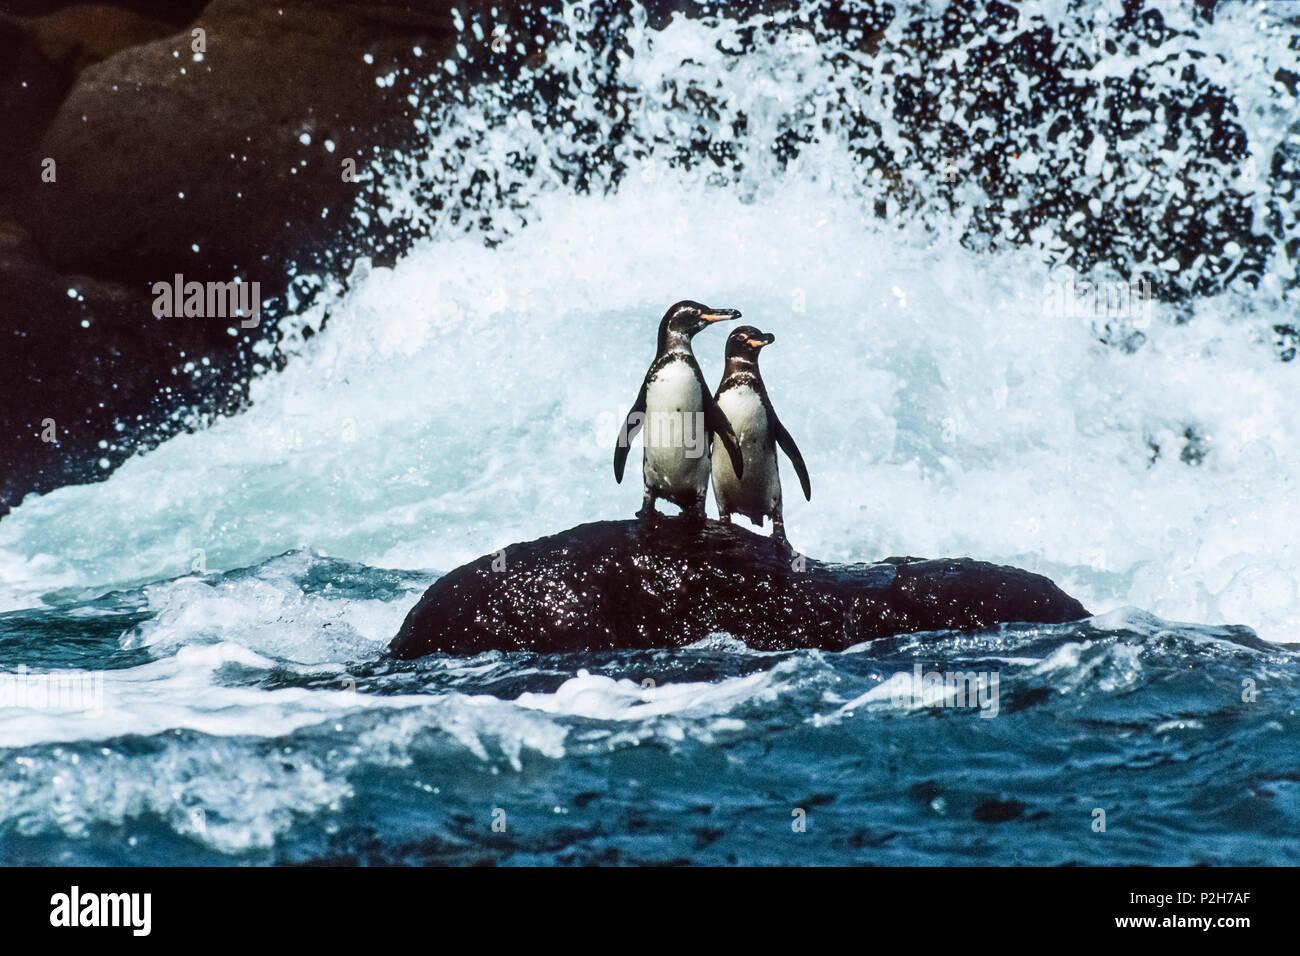 Galapagos Penguins in the surf, Spheniscus mendiculus, Galapagos Islands, Ecuador - Stock Image